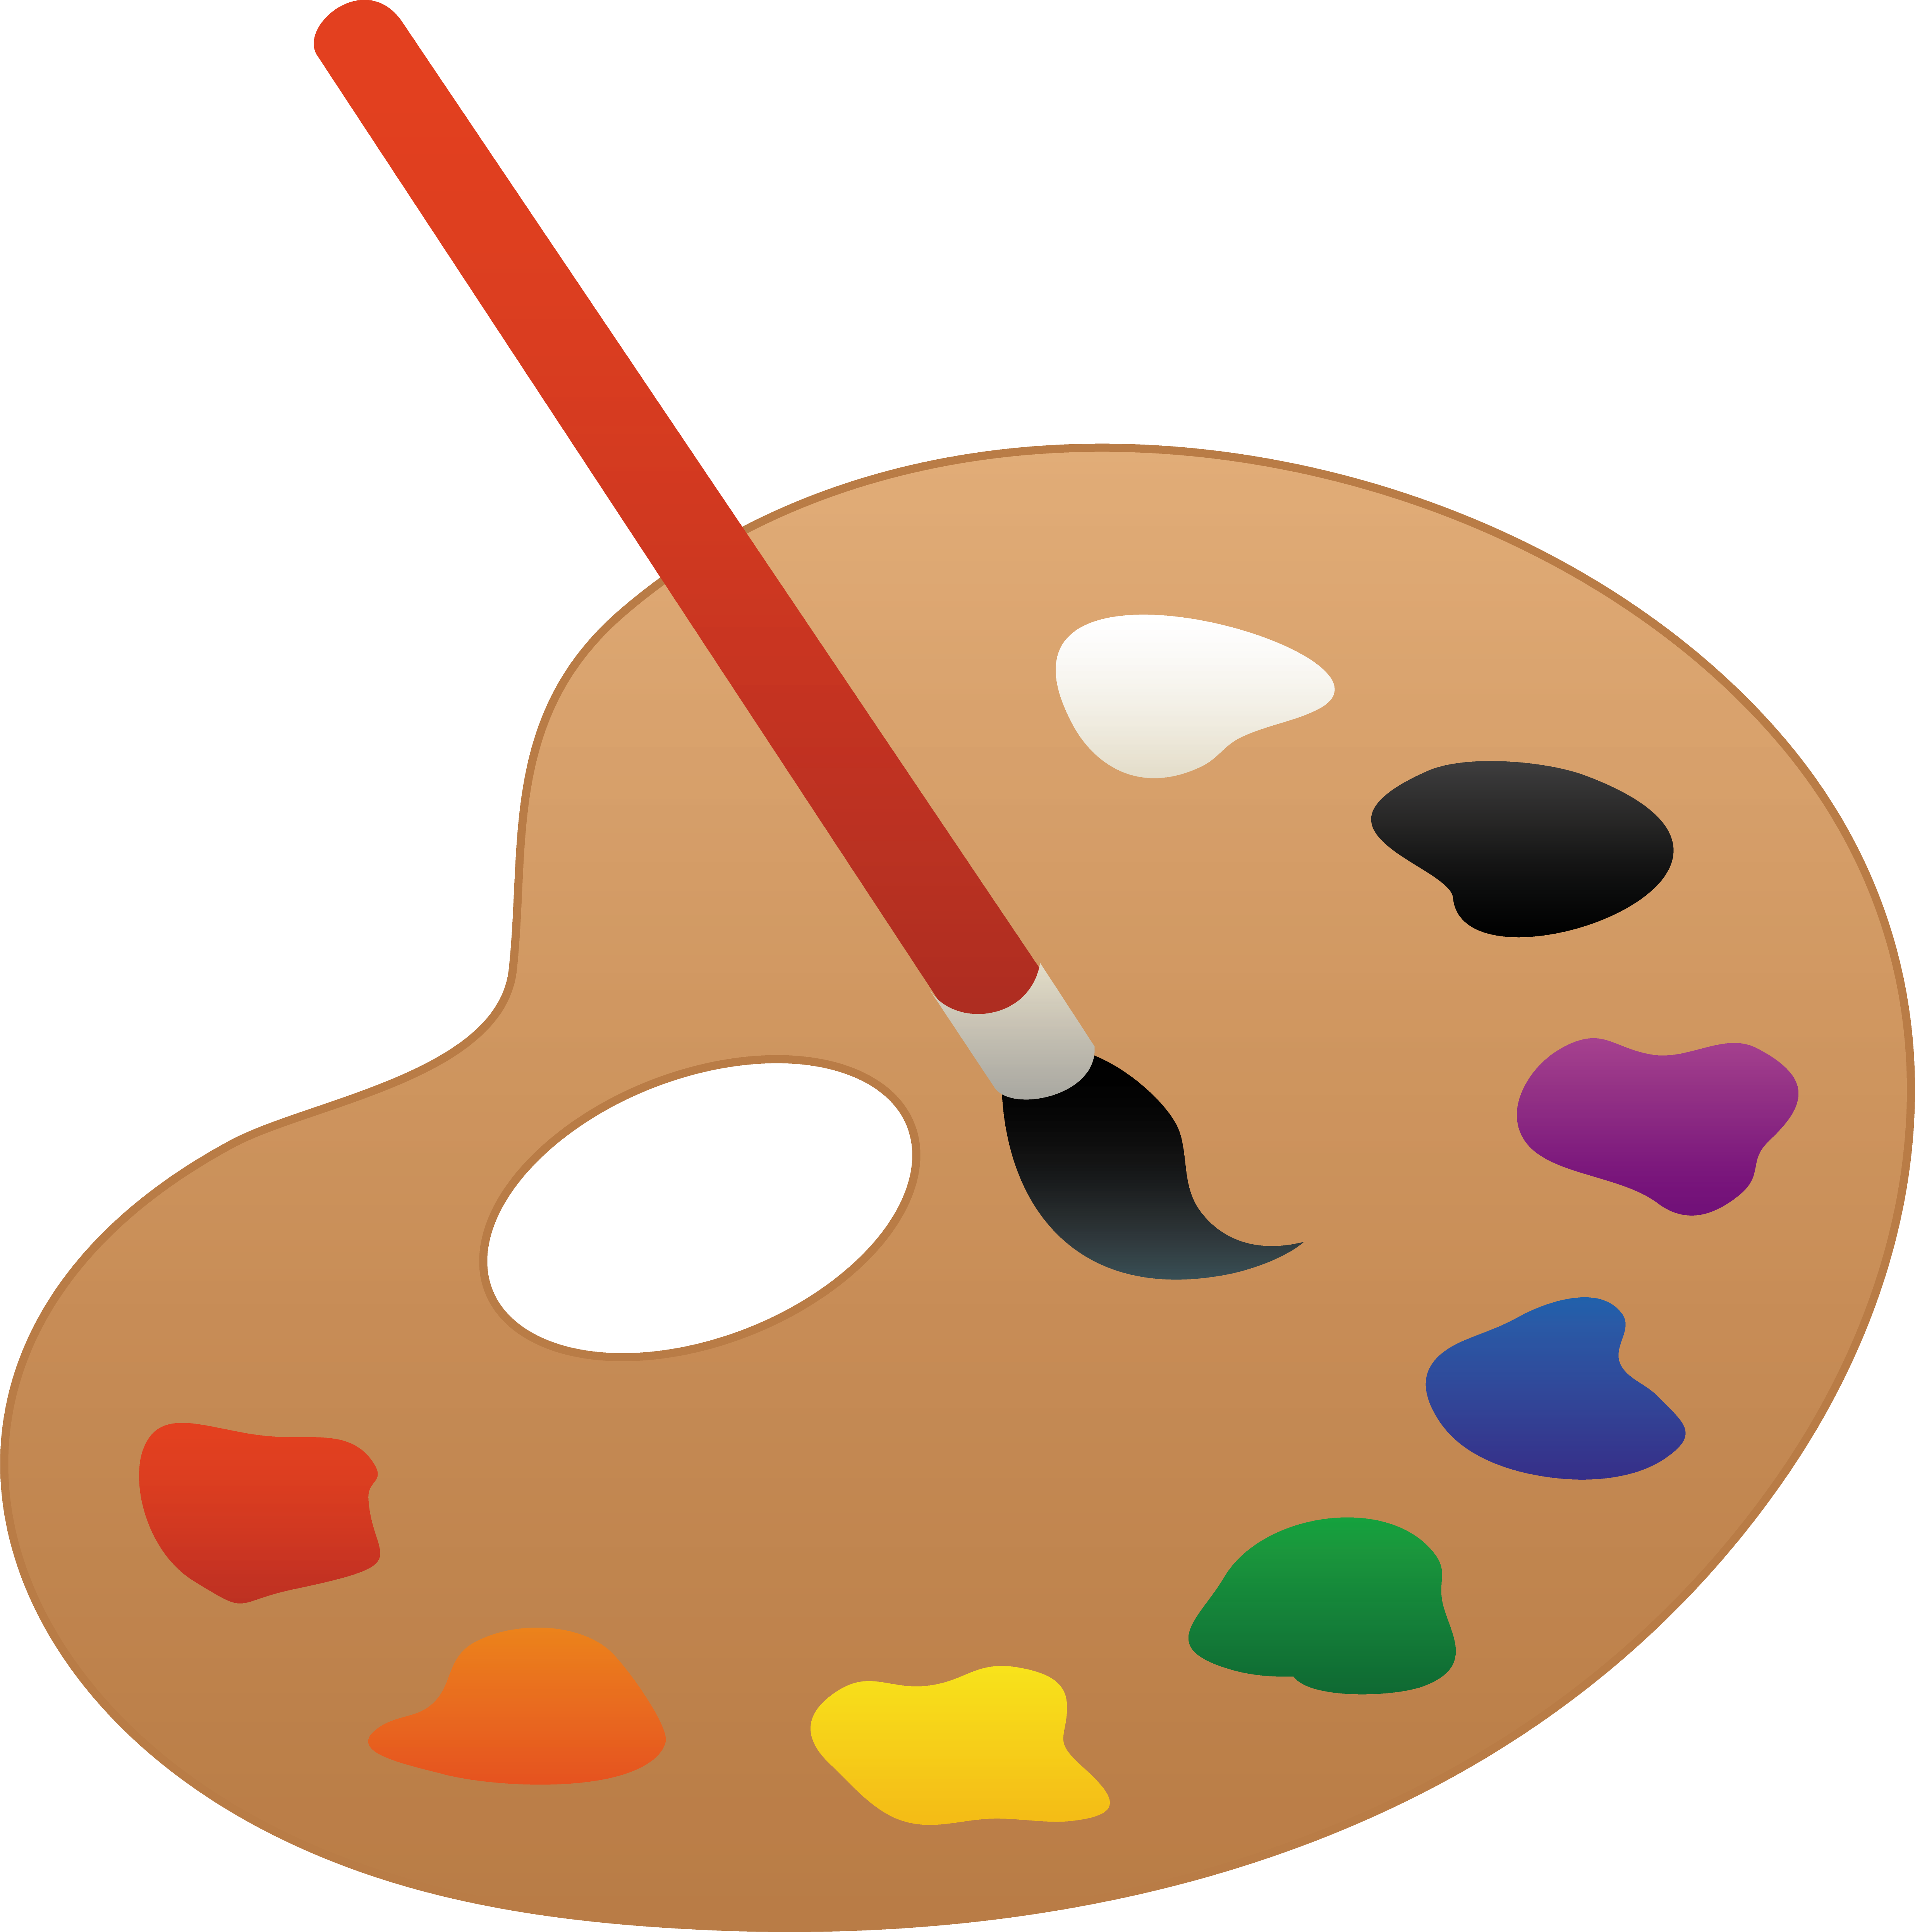 Watercolor Paints Singles Art Supplies Writing Brush Watercolor Paints Singles Supplies Writing Brush Painting Clipart Palette Clipar Palette Art Art Party Art